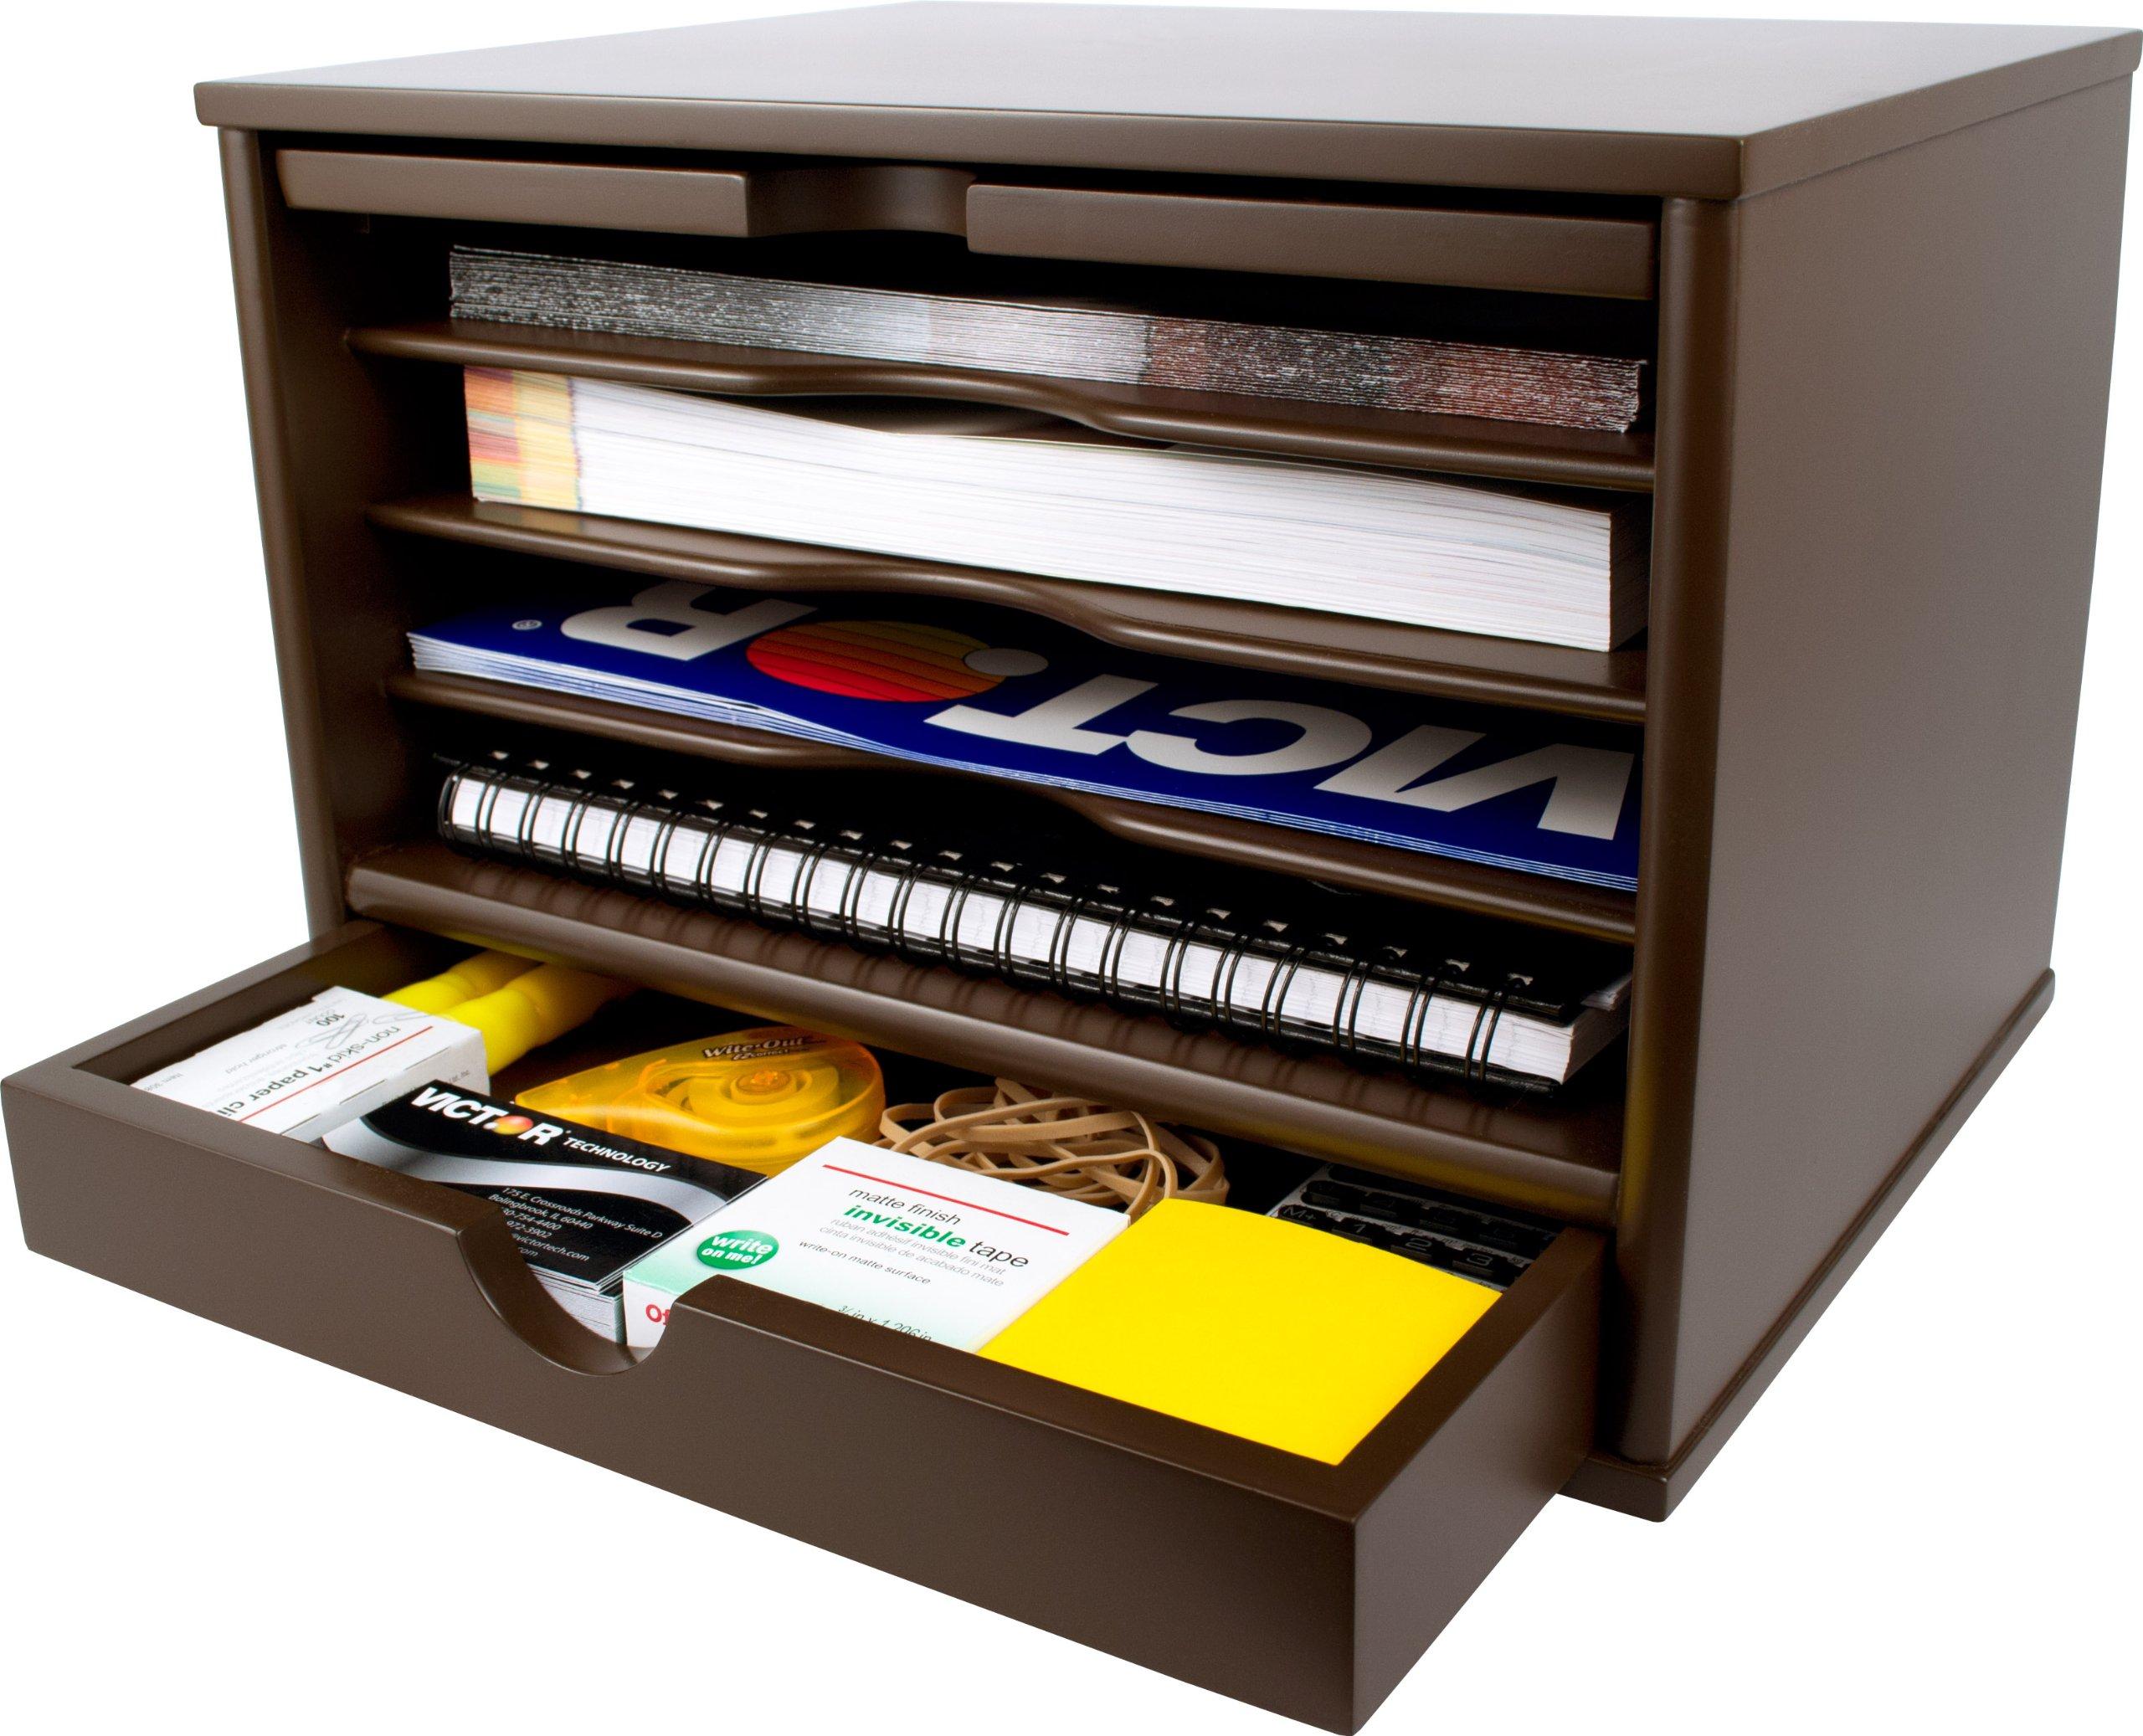 Victor Wood Desktop Organizer with Closing Door, B4720 (Mocha Brown)